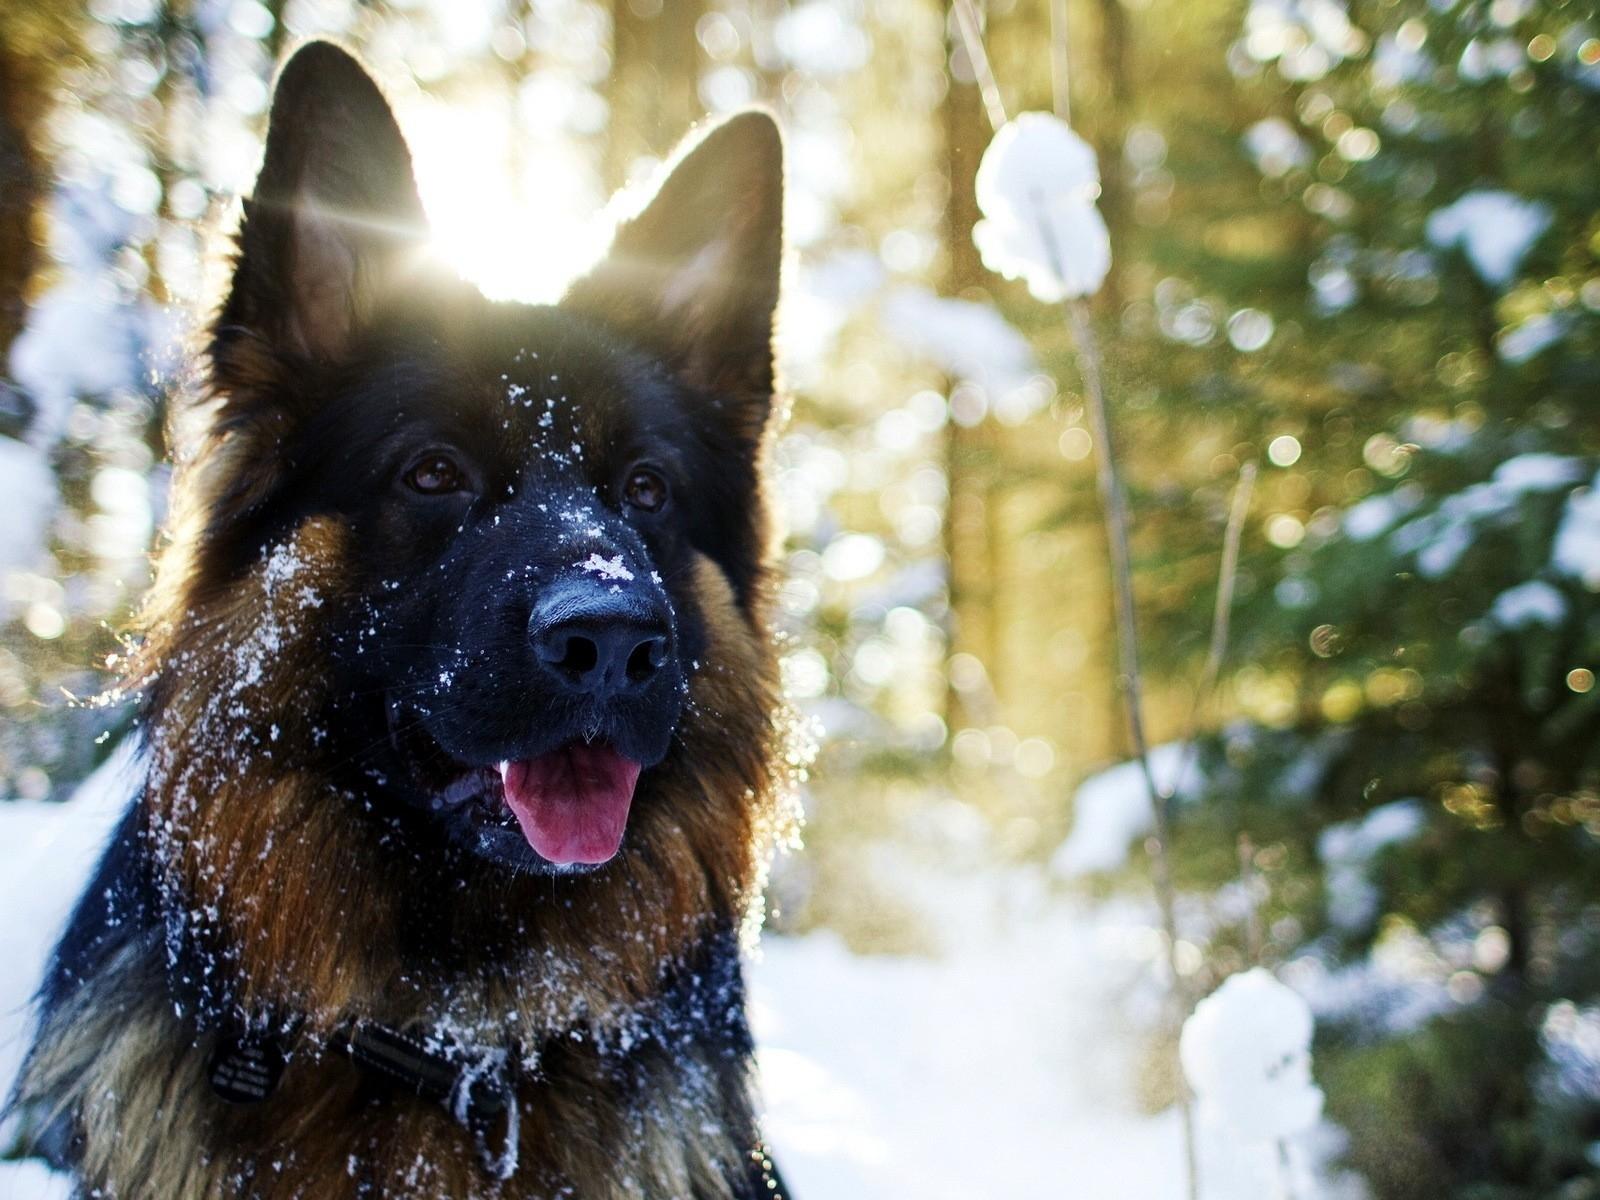 snow_animals_dogs_german_shepherd_Wallpaper_1600x1200_www.wallpaperswa.com.jpg